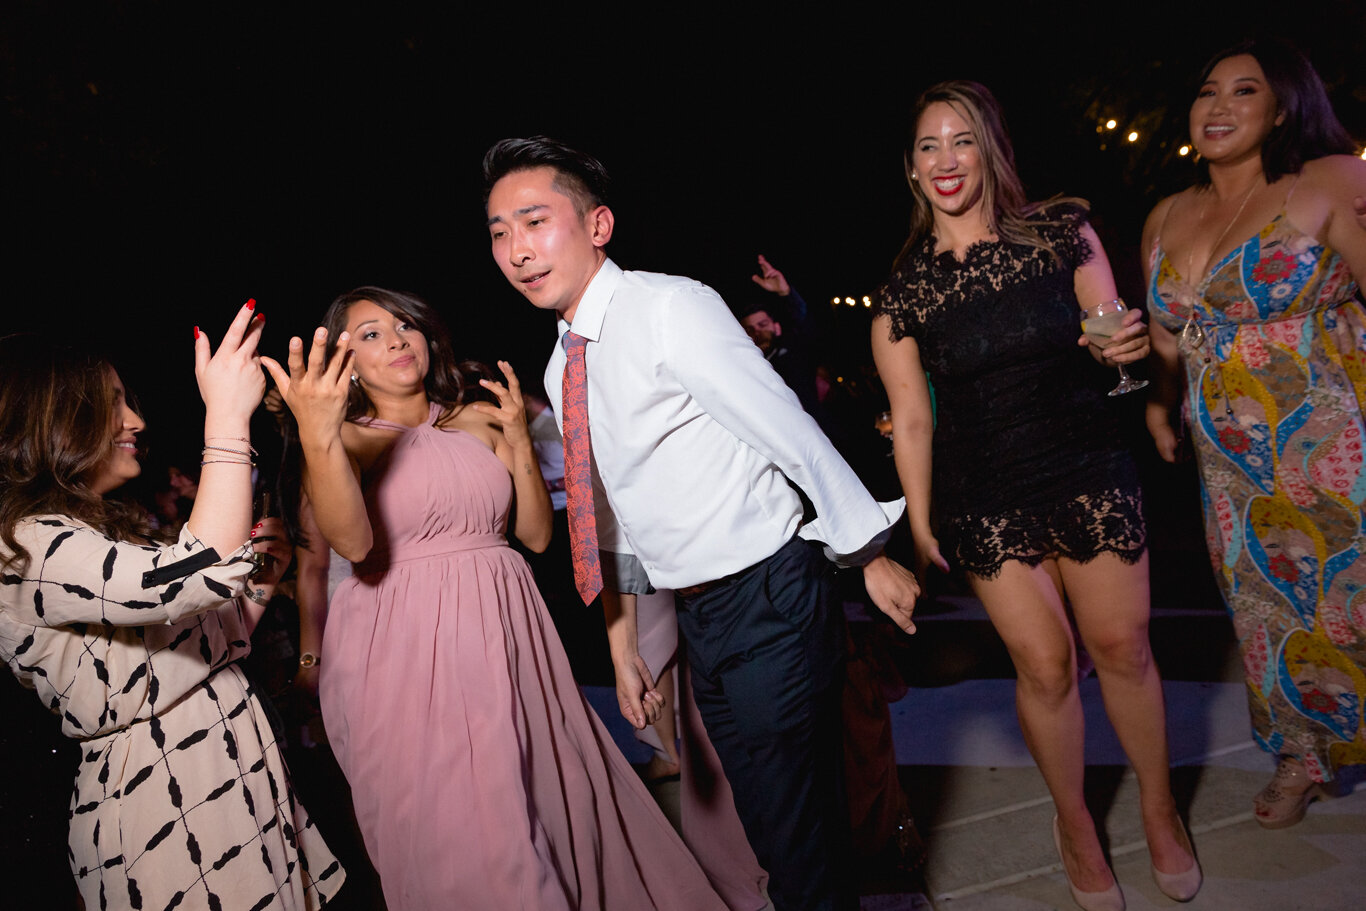 2019.08.24_Emily-Ashir-Wedding-at-the-Maples-6589.jpg